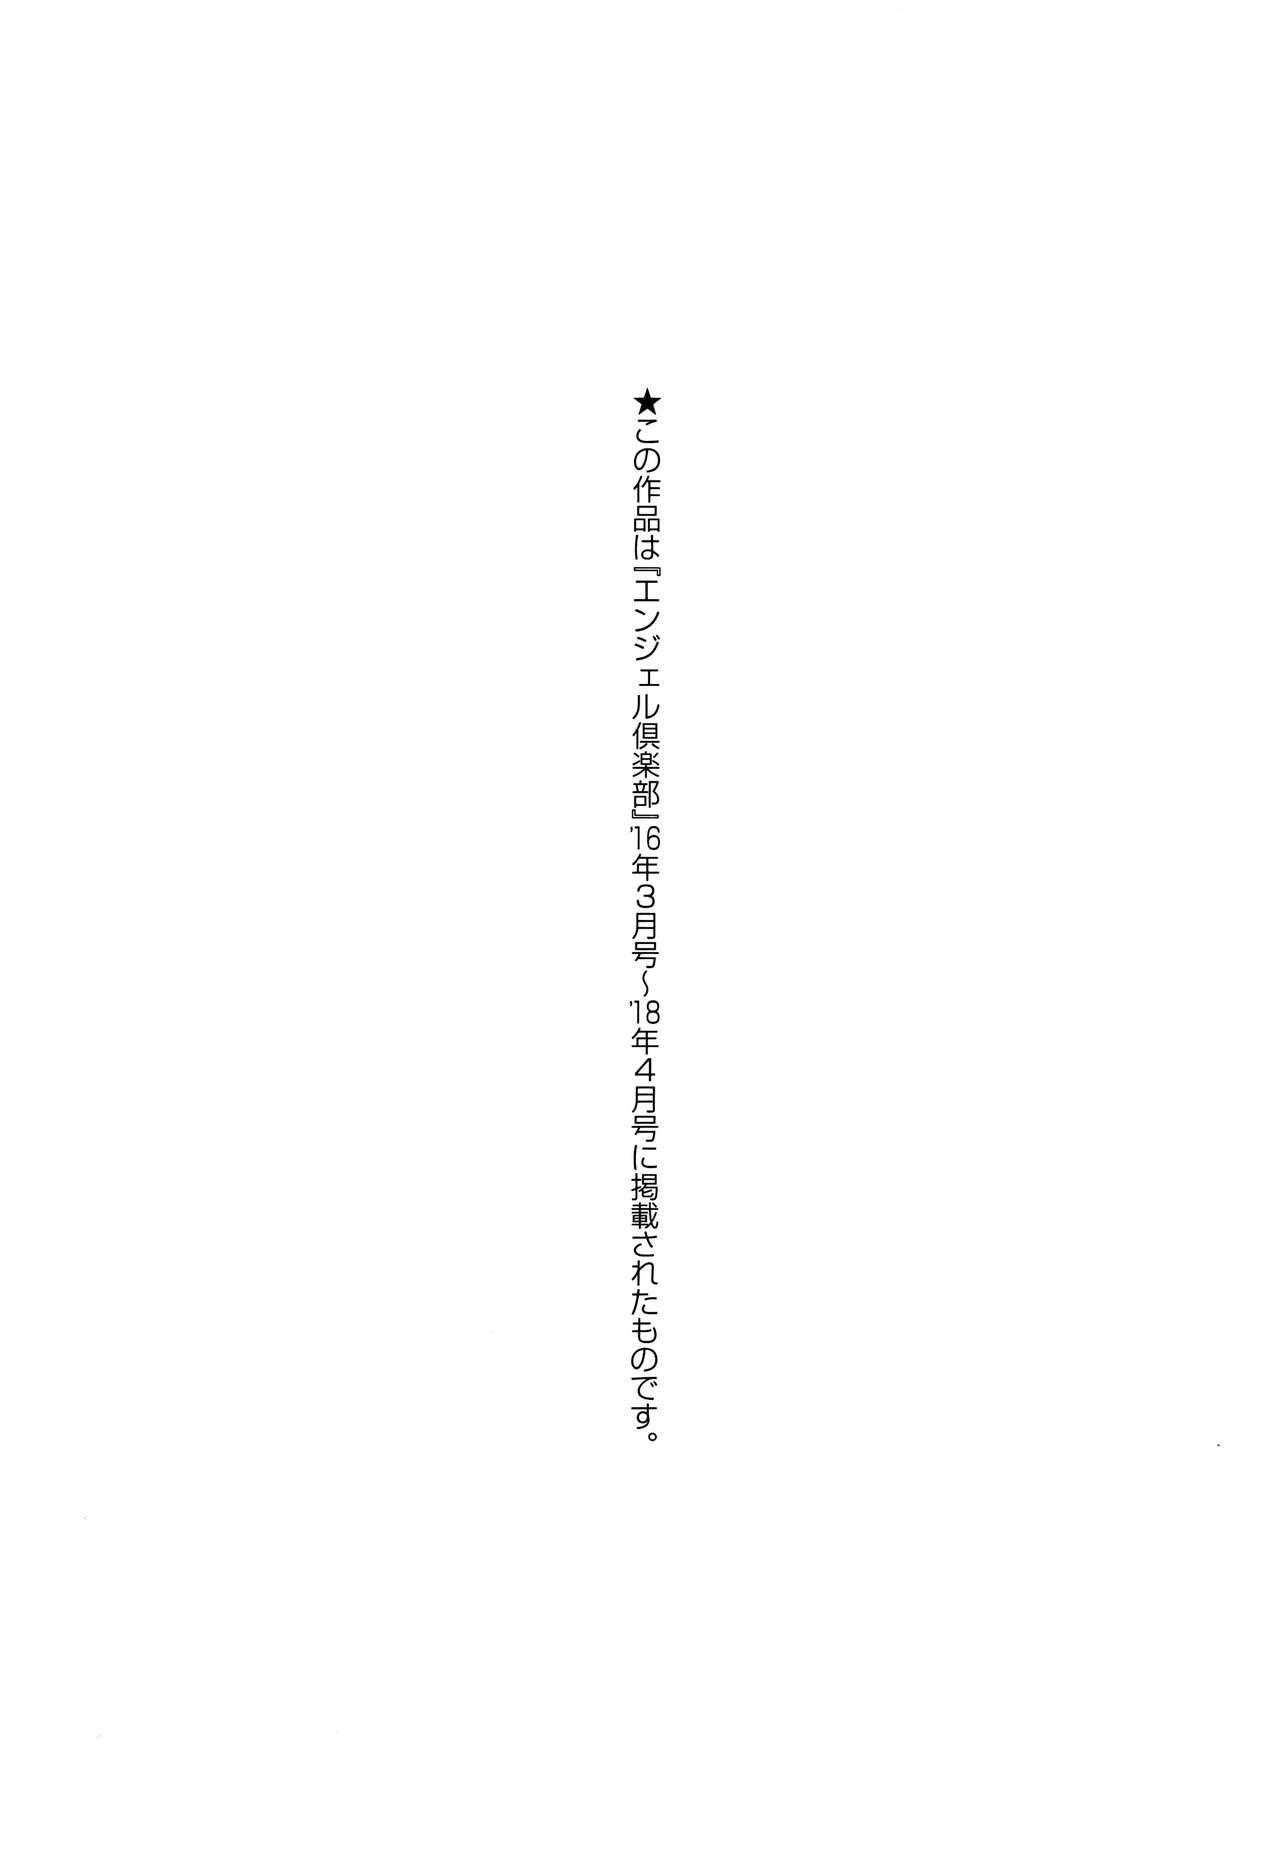 [Inoue Nanaki] Joushiki Daha! Kuro Gal Bitch-ka Seikatsu Ch. 1-3, 5-8 [English] [Dark Mac + N04h] 146